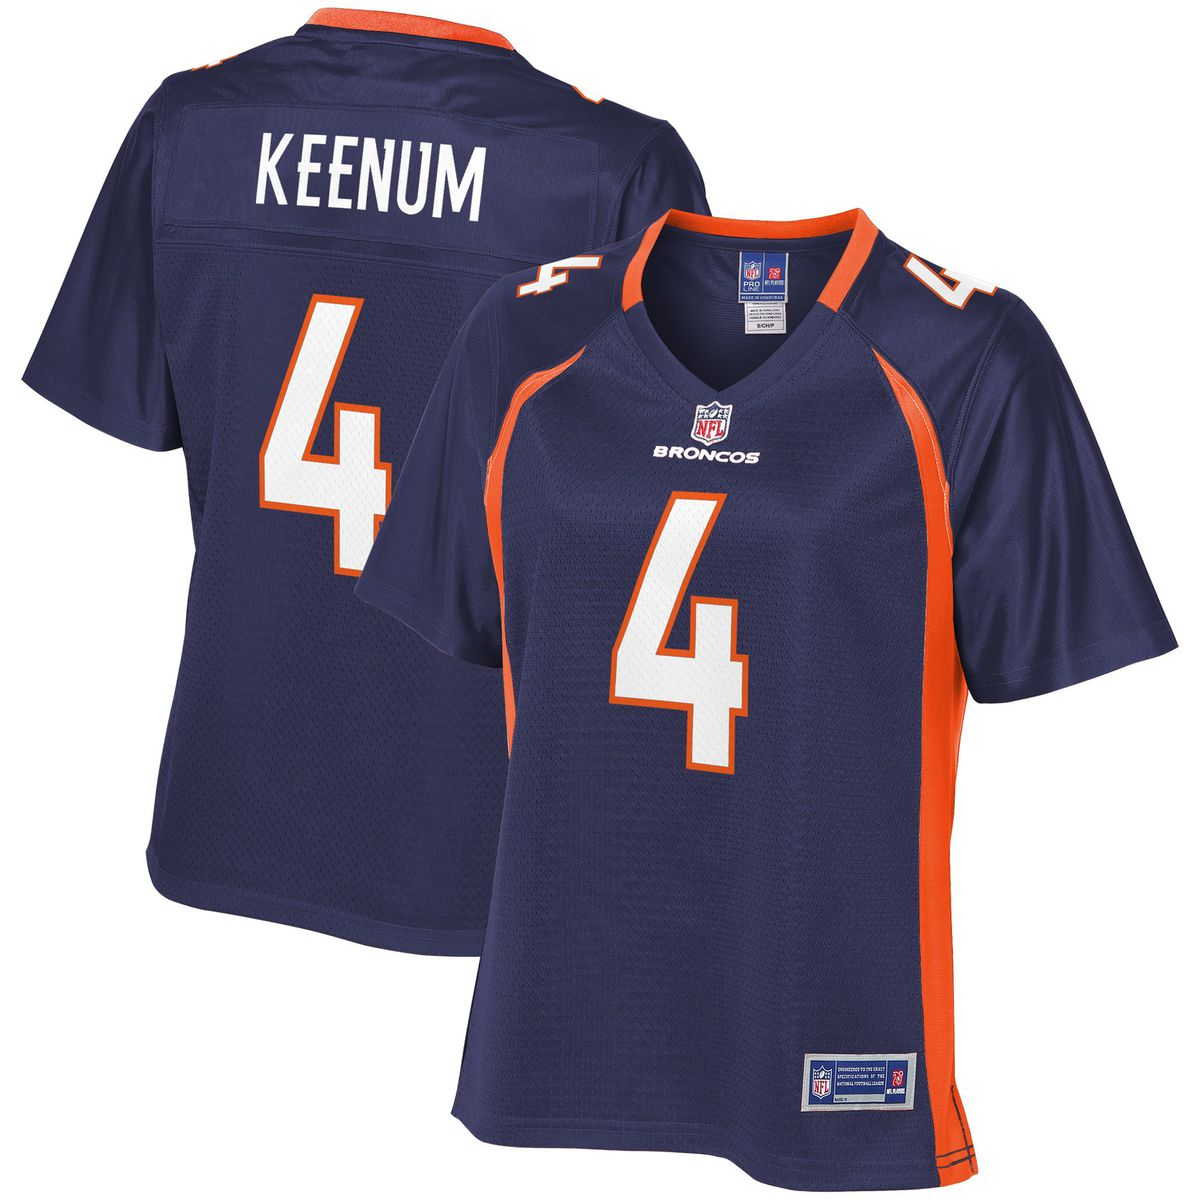 37d5ecc7399 Case Keenum Denver Broncos Nike Women's Pro Line Jersey for $99.99  NFLShop.com. Nike Player Pride T-shirt ...